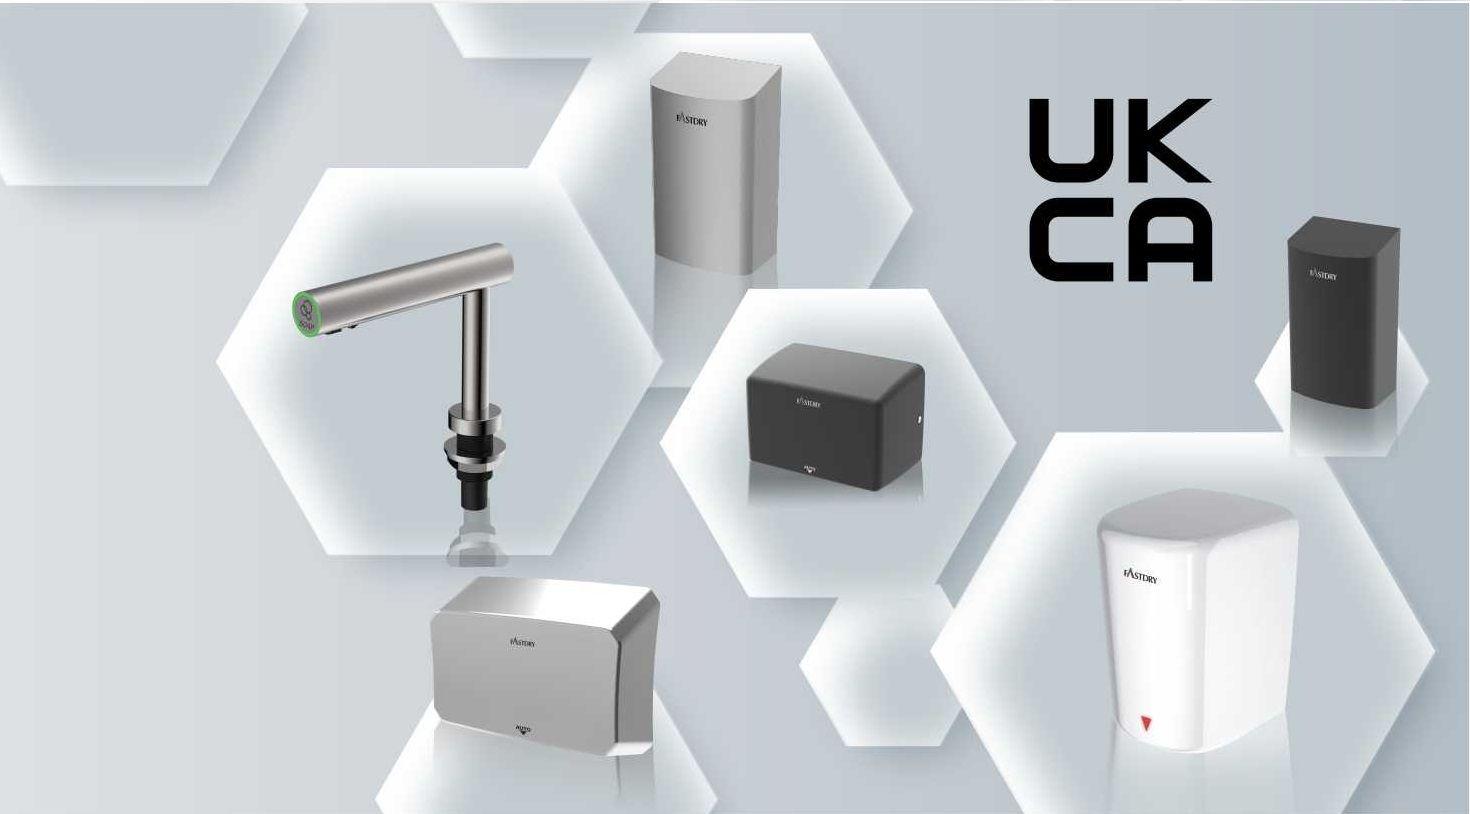 Hokwang Pengering Tangan Bersertifikat UKCA dan Dispenser Sabun Otomatis